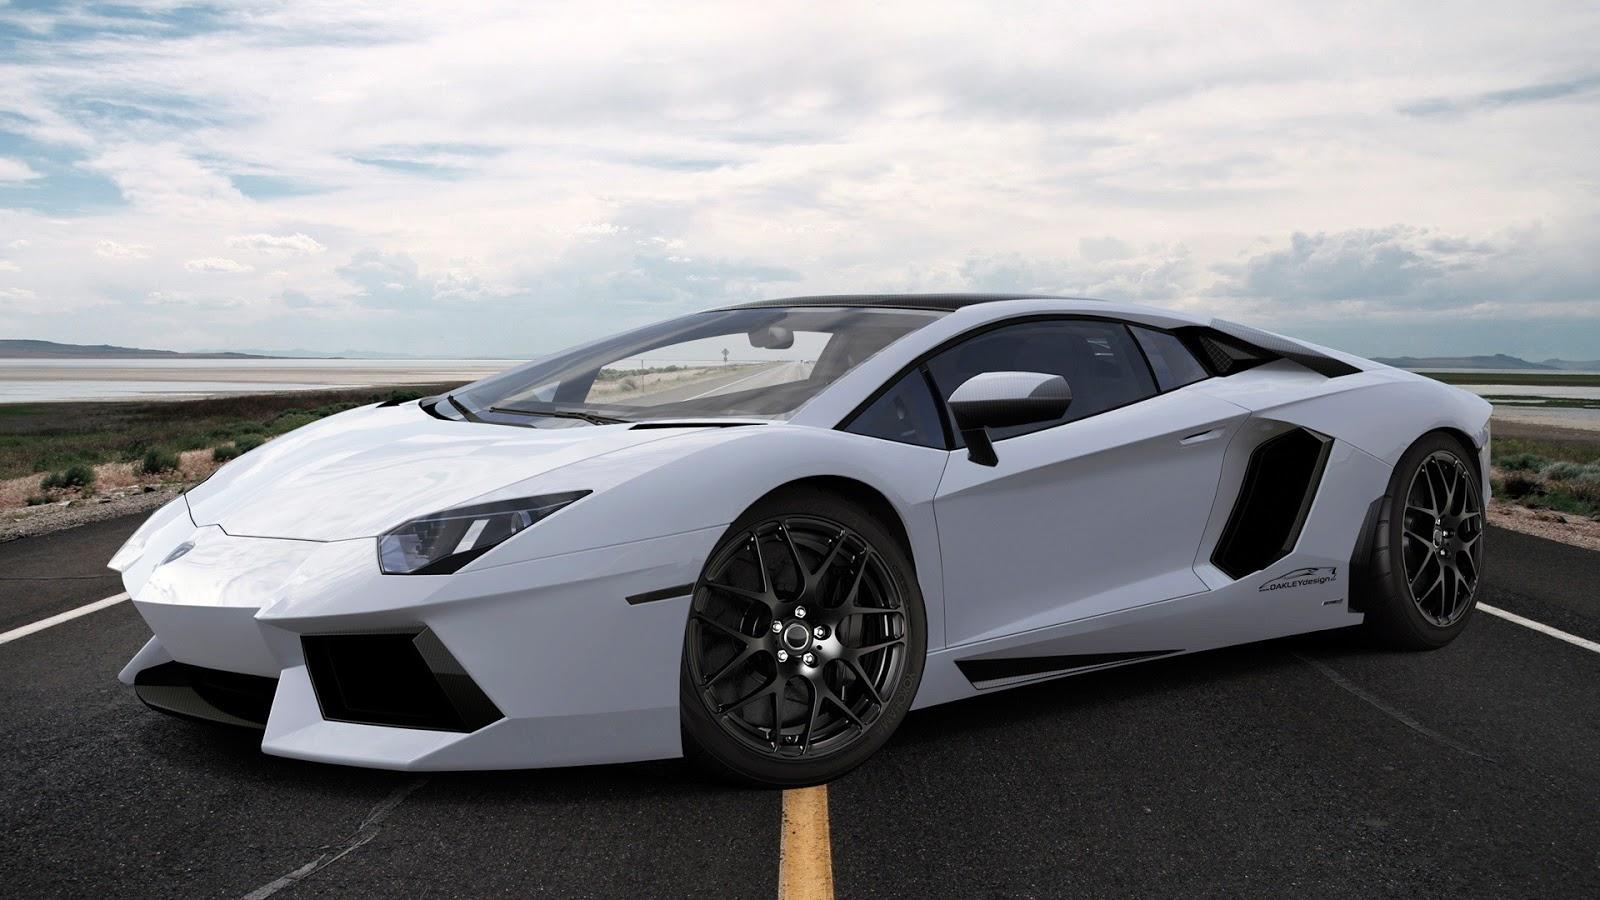 White Lamborghini on Highway